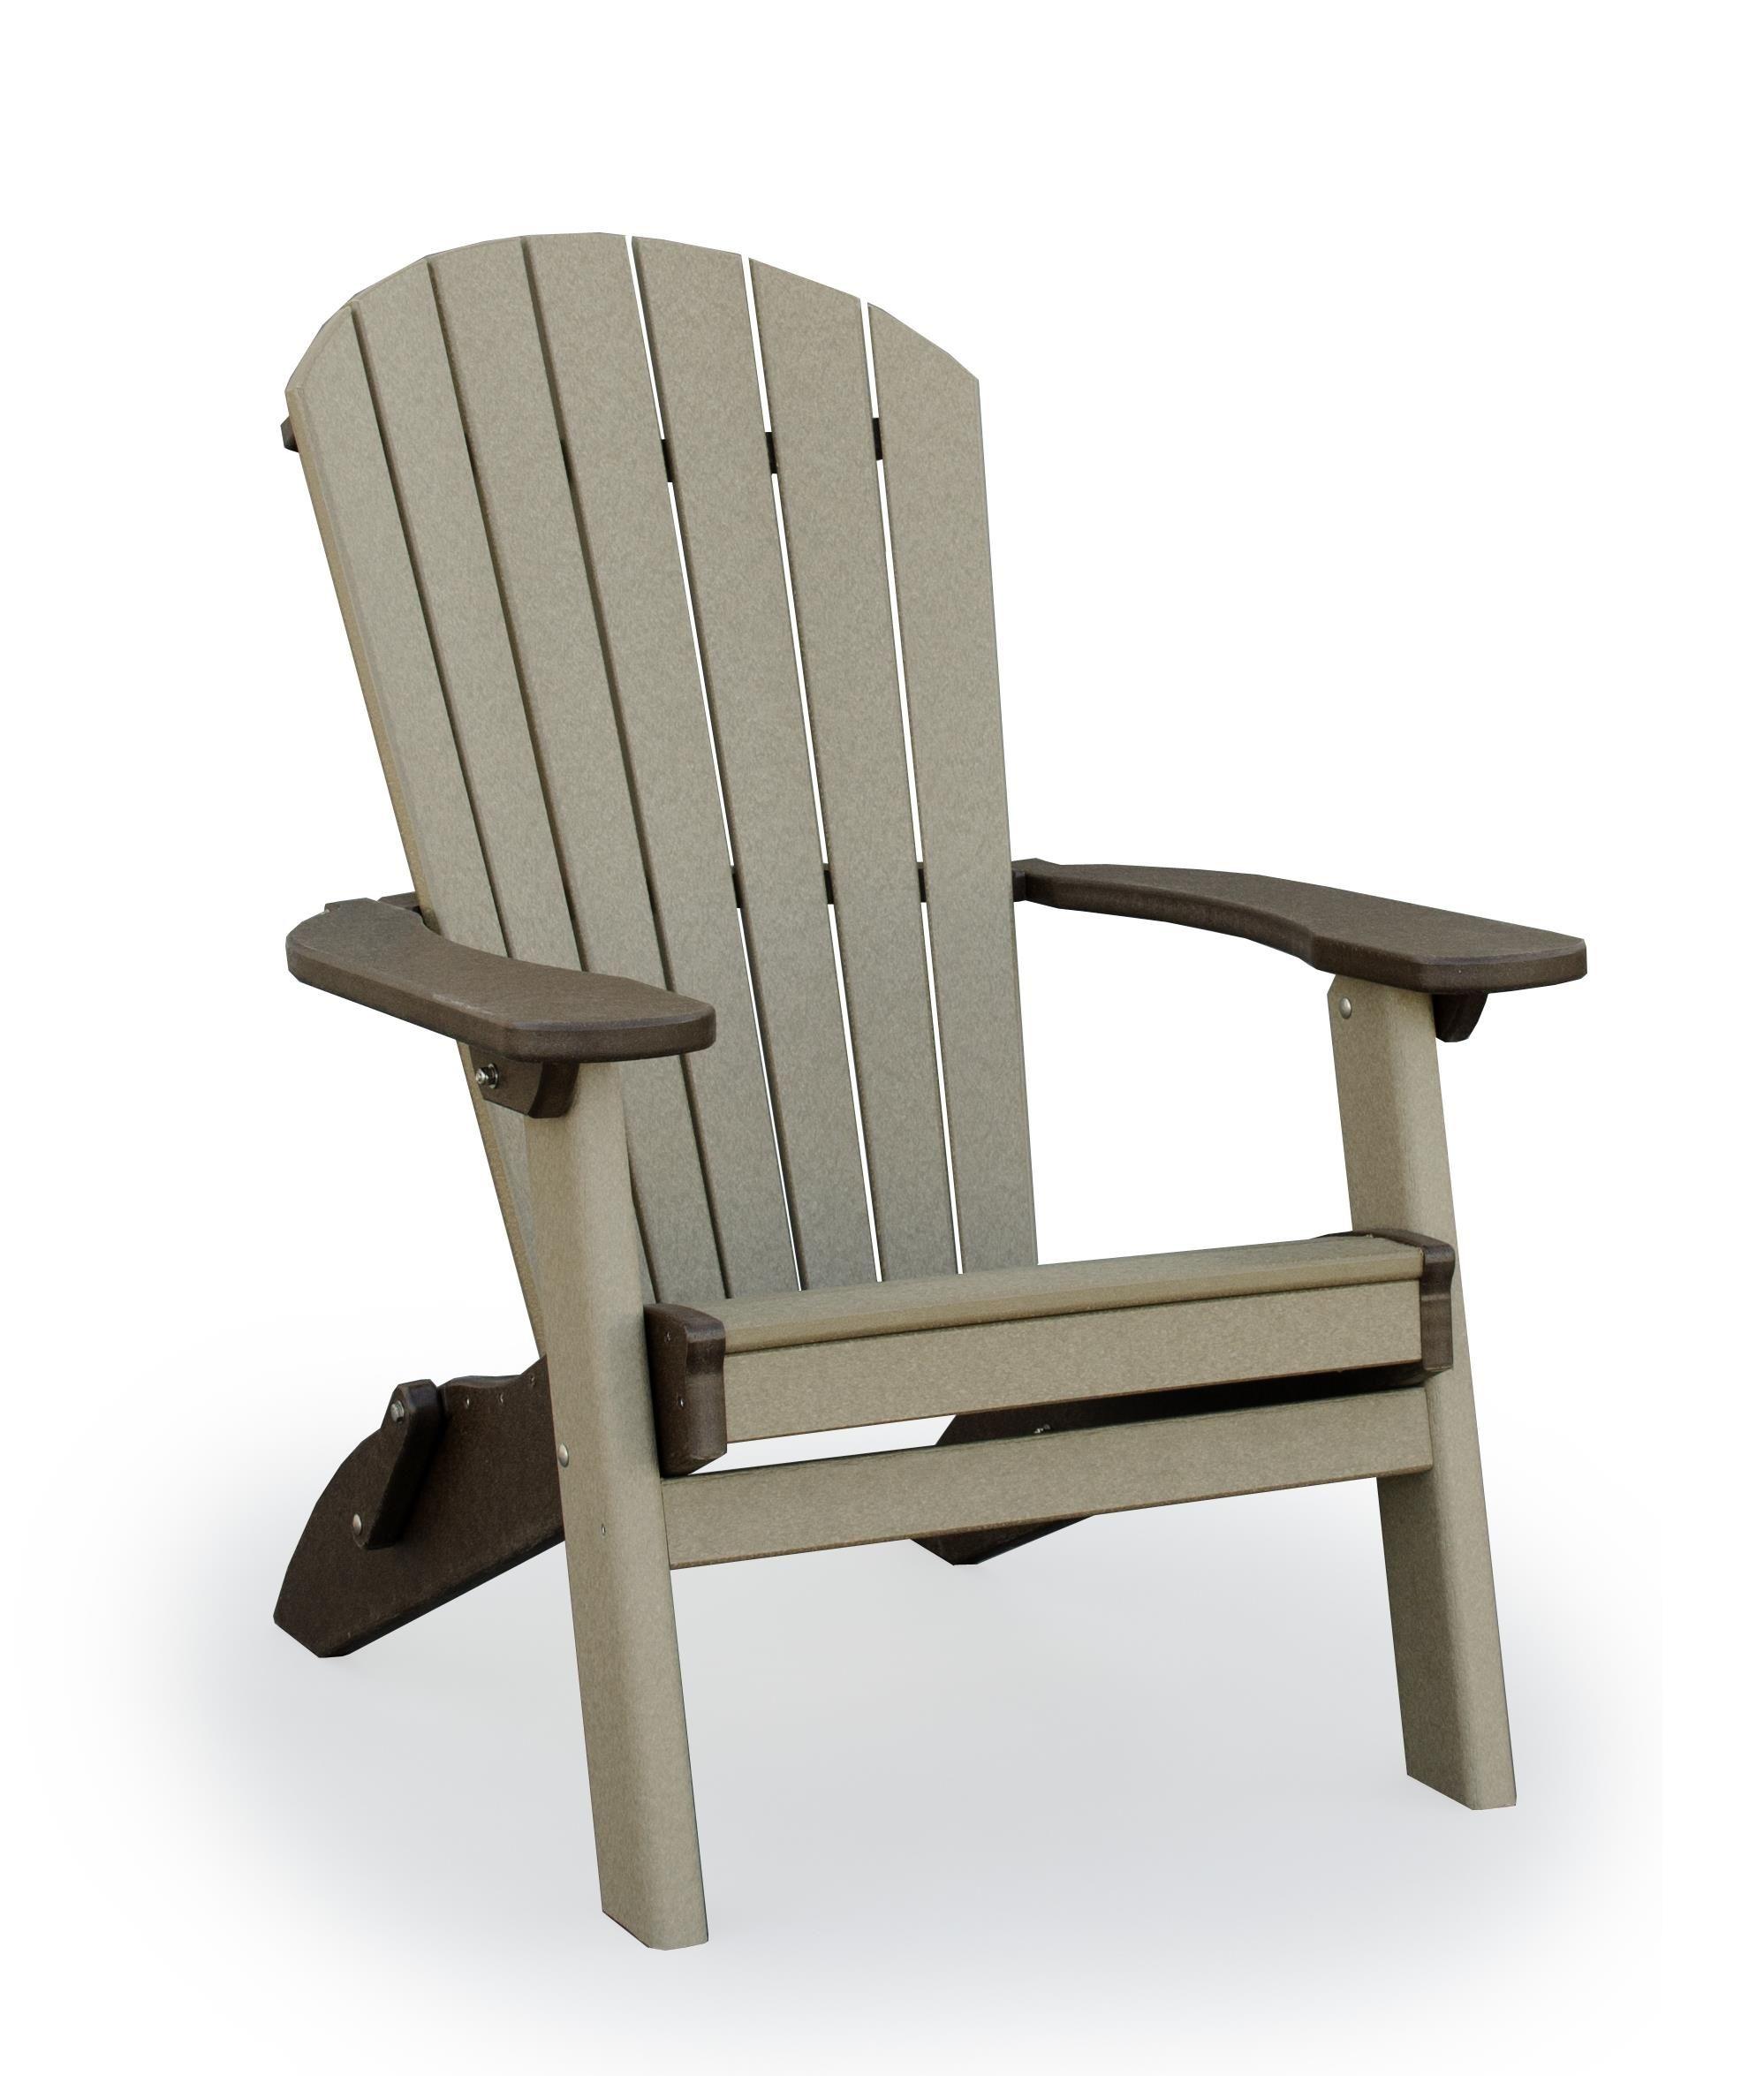 Patio Folding Chairs Cheap Modern Furniture Cheap Outdoor